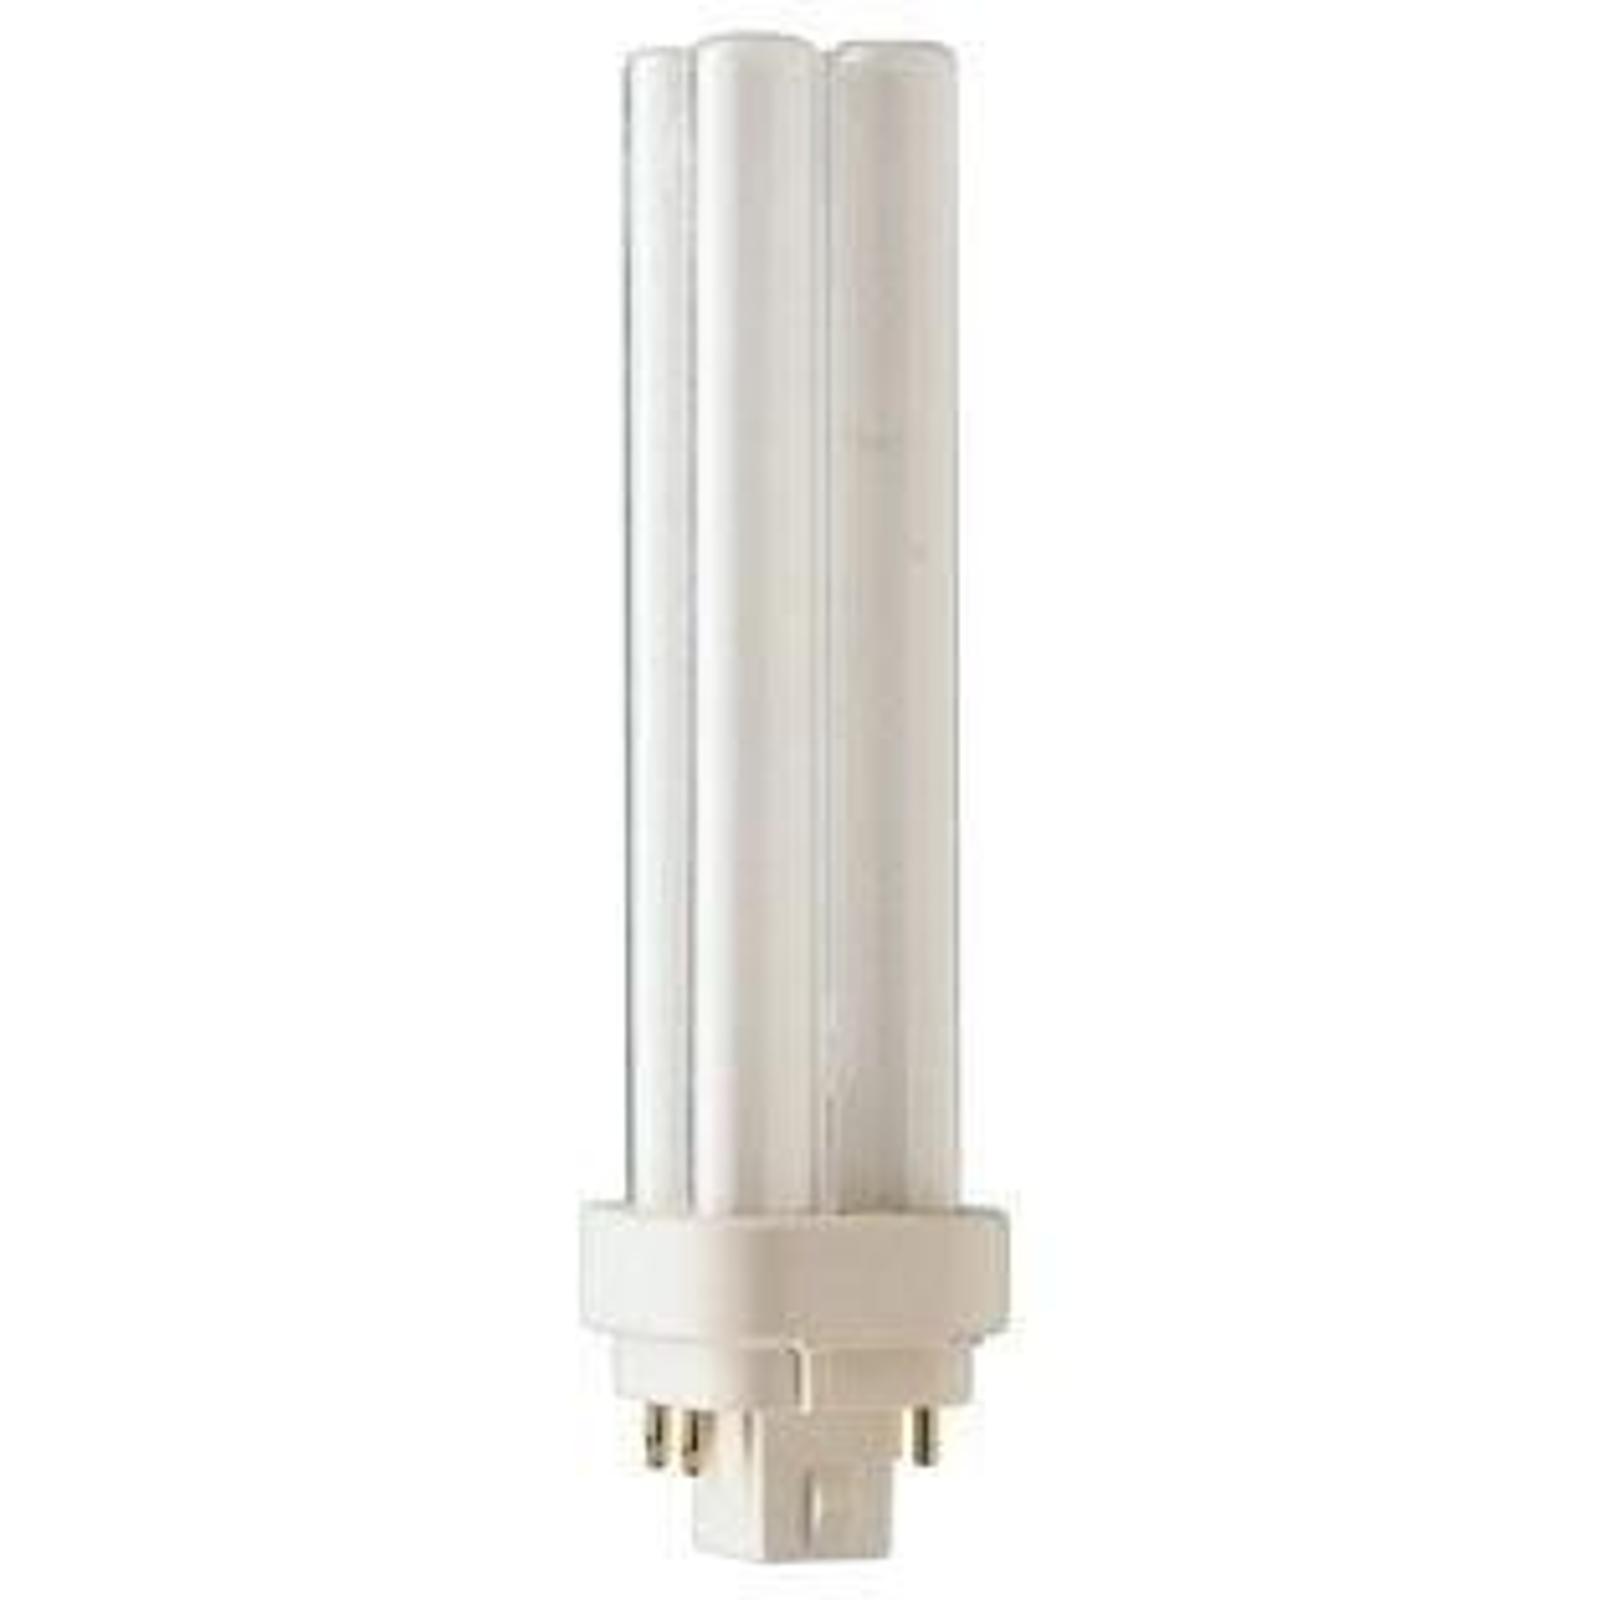 G24q 13W 840 Kompaktleuchtstofflampe DULUX D/E